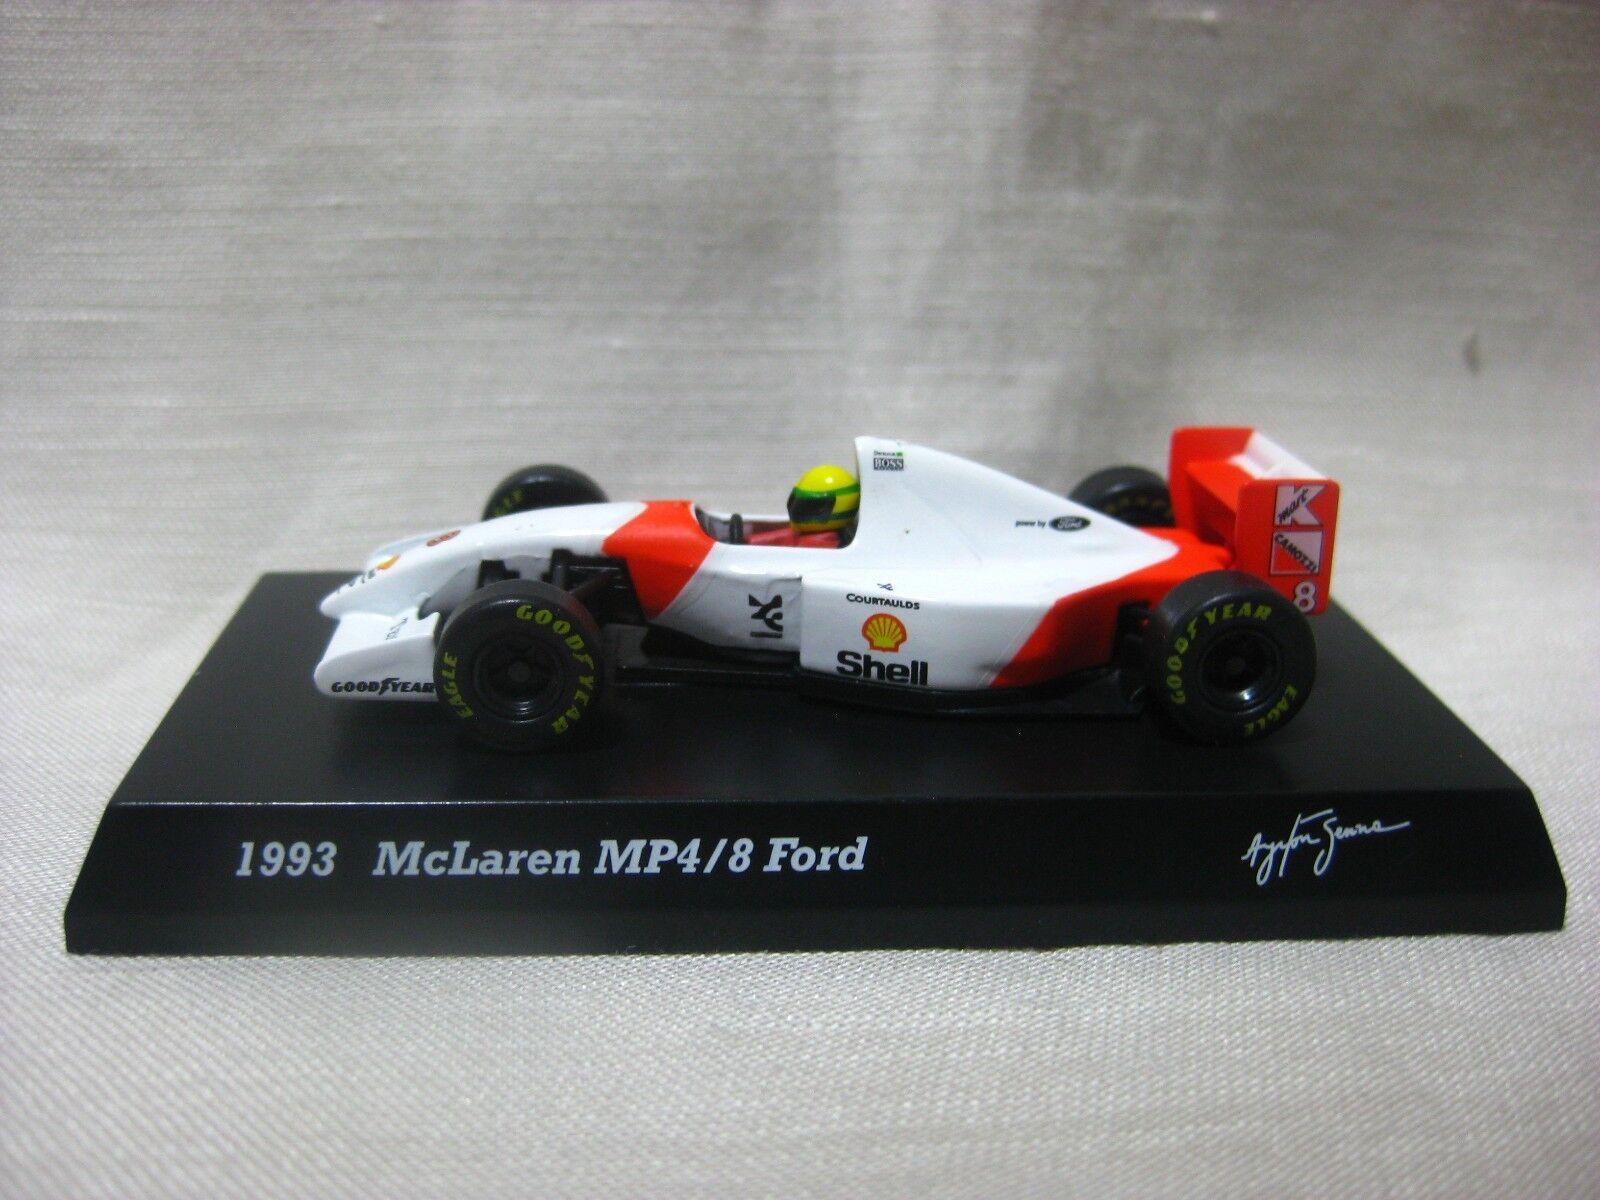 1 64 Kyosho McLaren MP4 8 1993 Ford Diecast Model Car